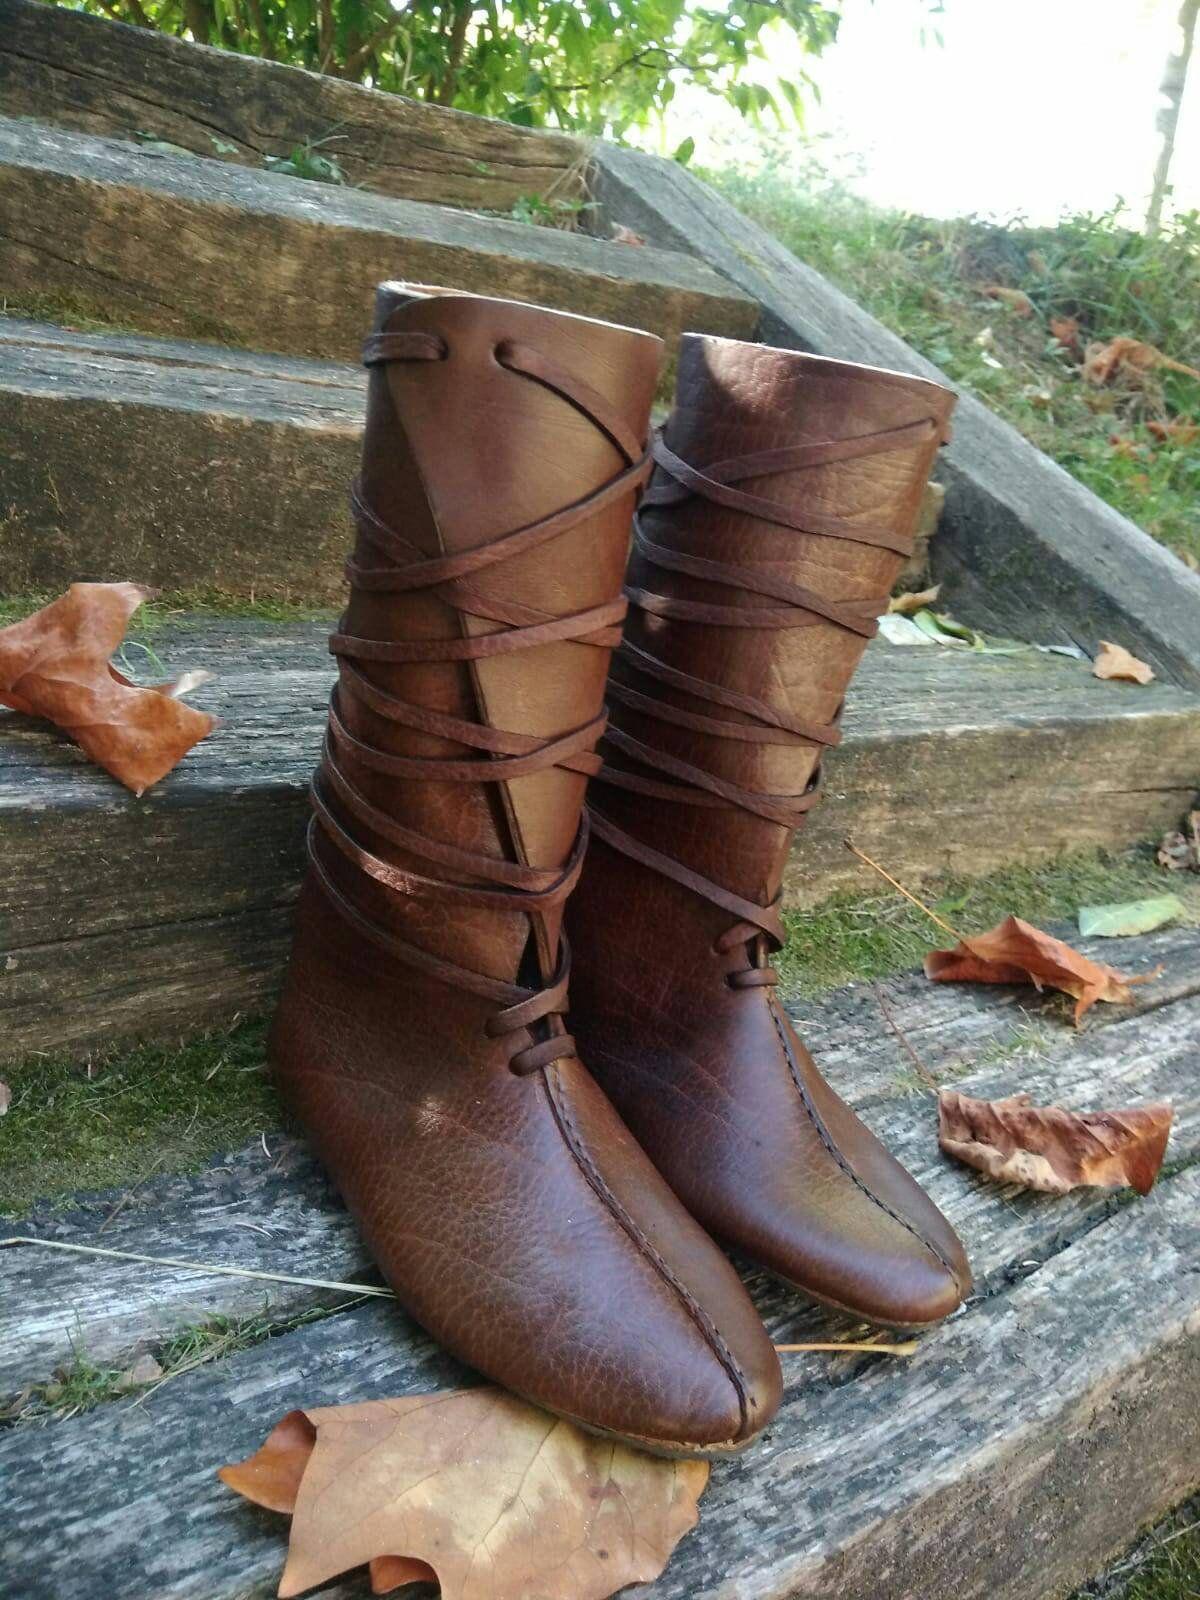 Mittelalter Schuhe Stiefel Lederstiefel Wikingerstiefel Larp